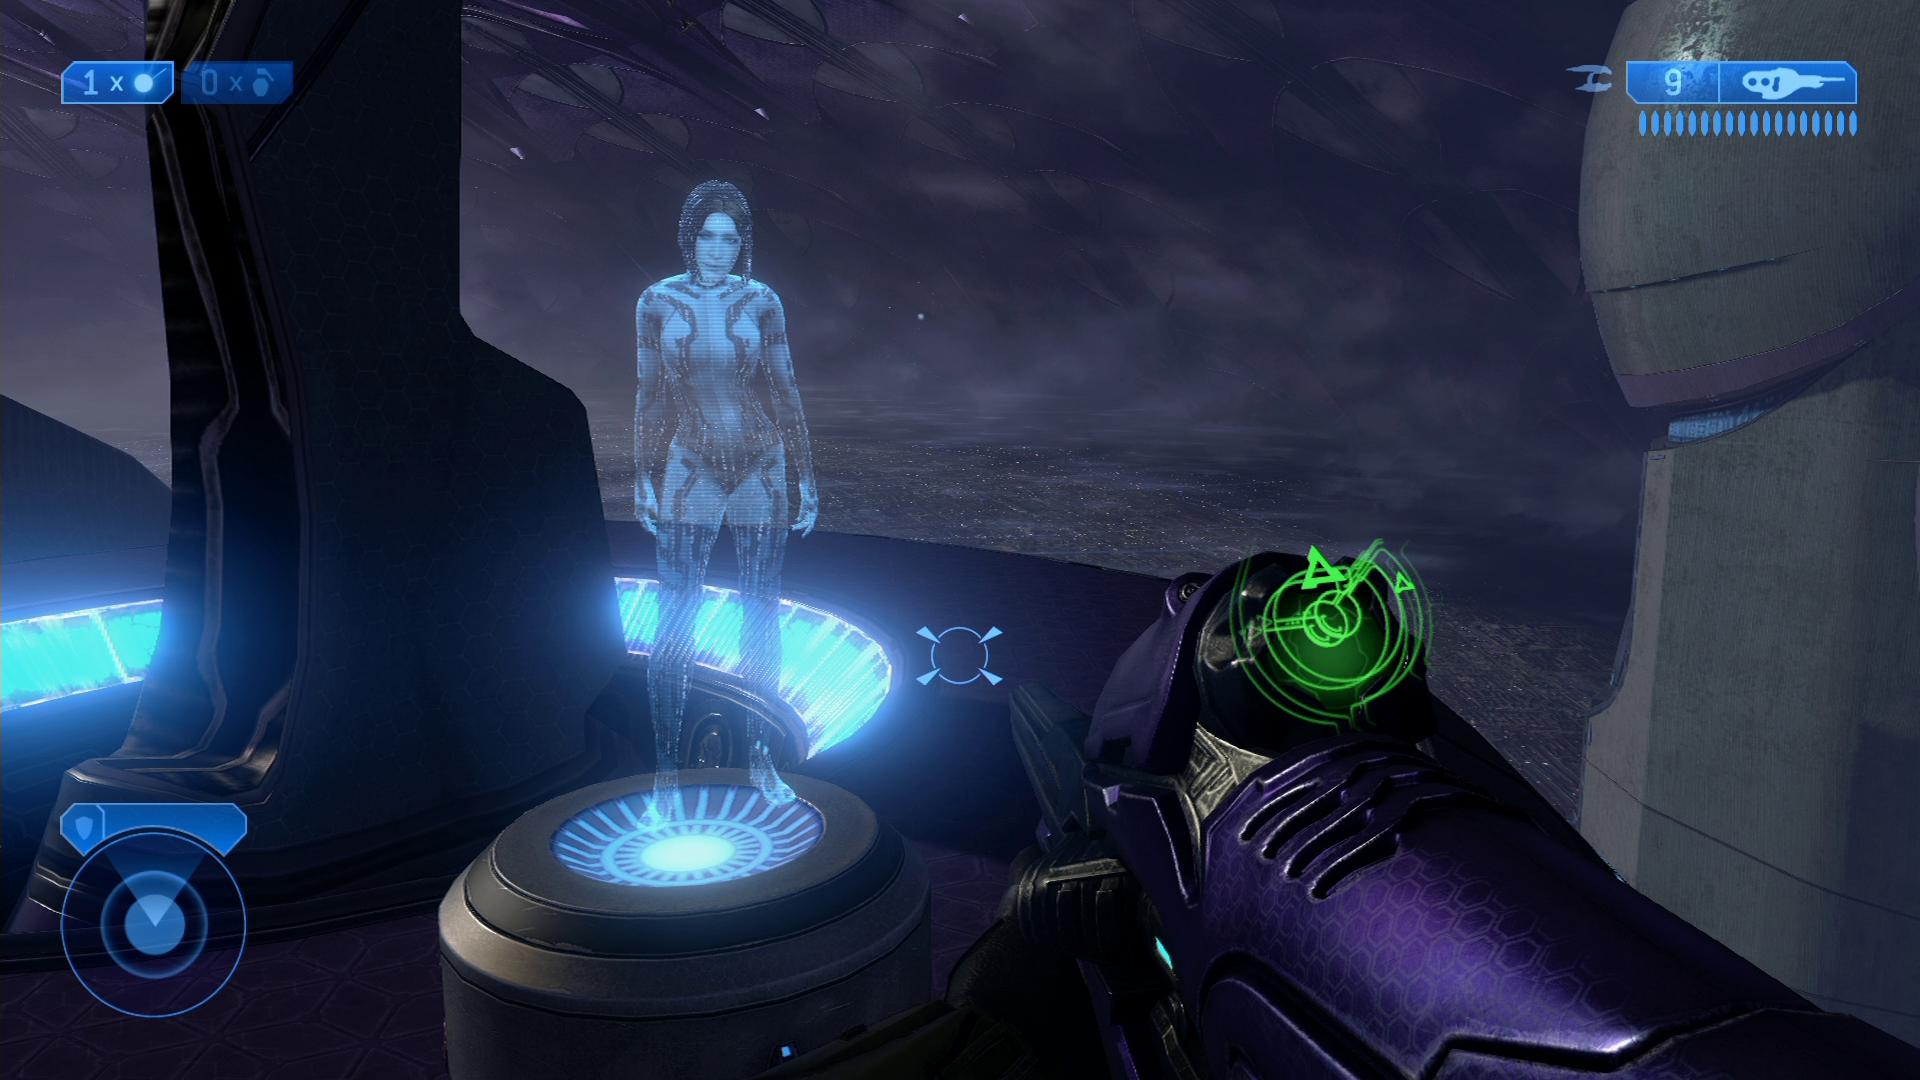 Halo 2 Xp Gravemind Level Fix